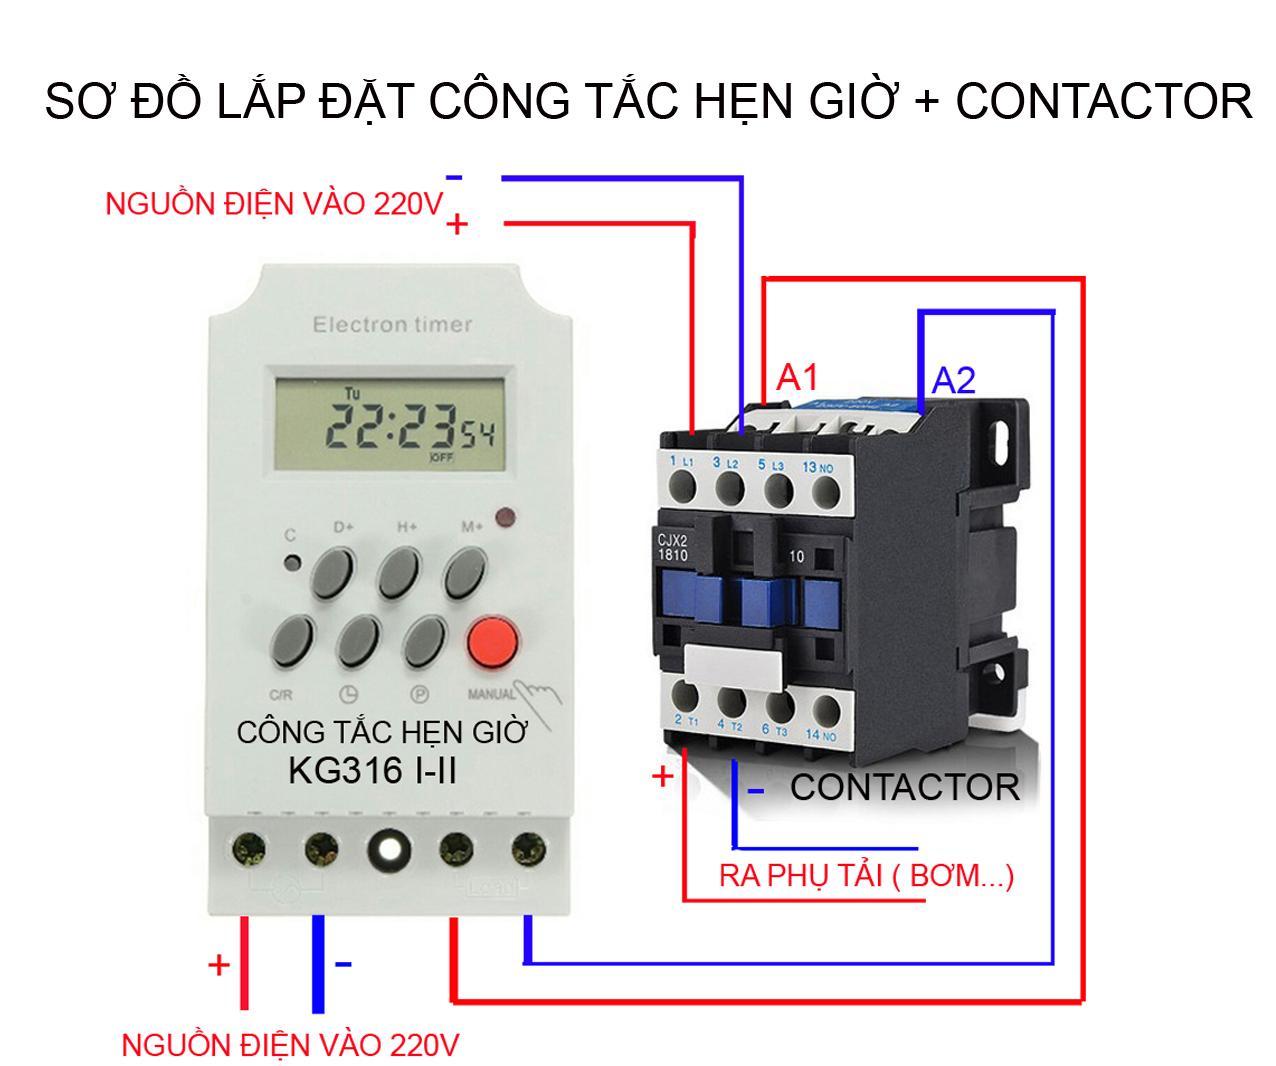 SO DO LAP CONTACTOR VA CONG TAC.jpg